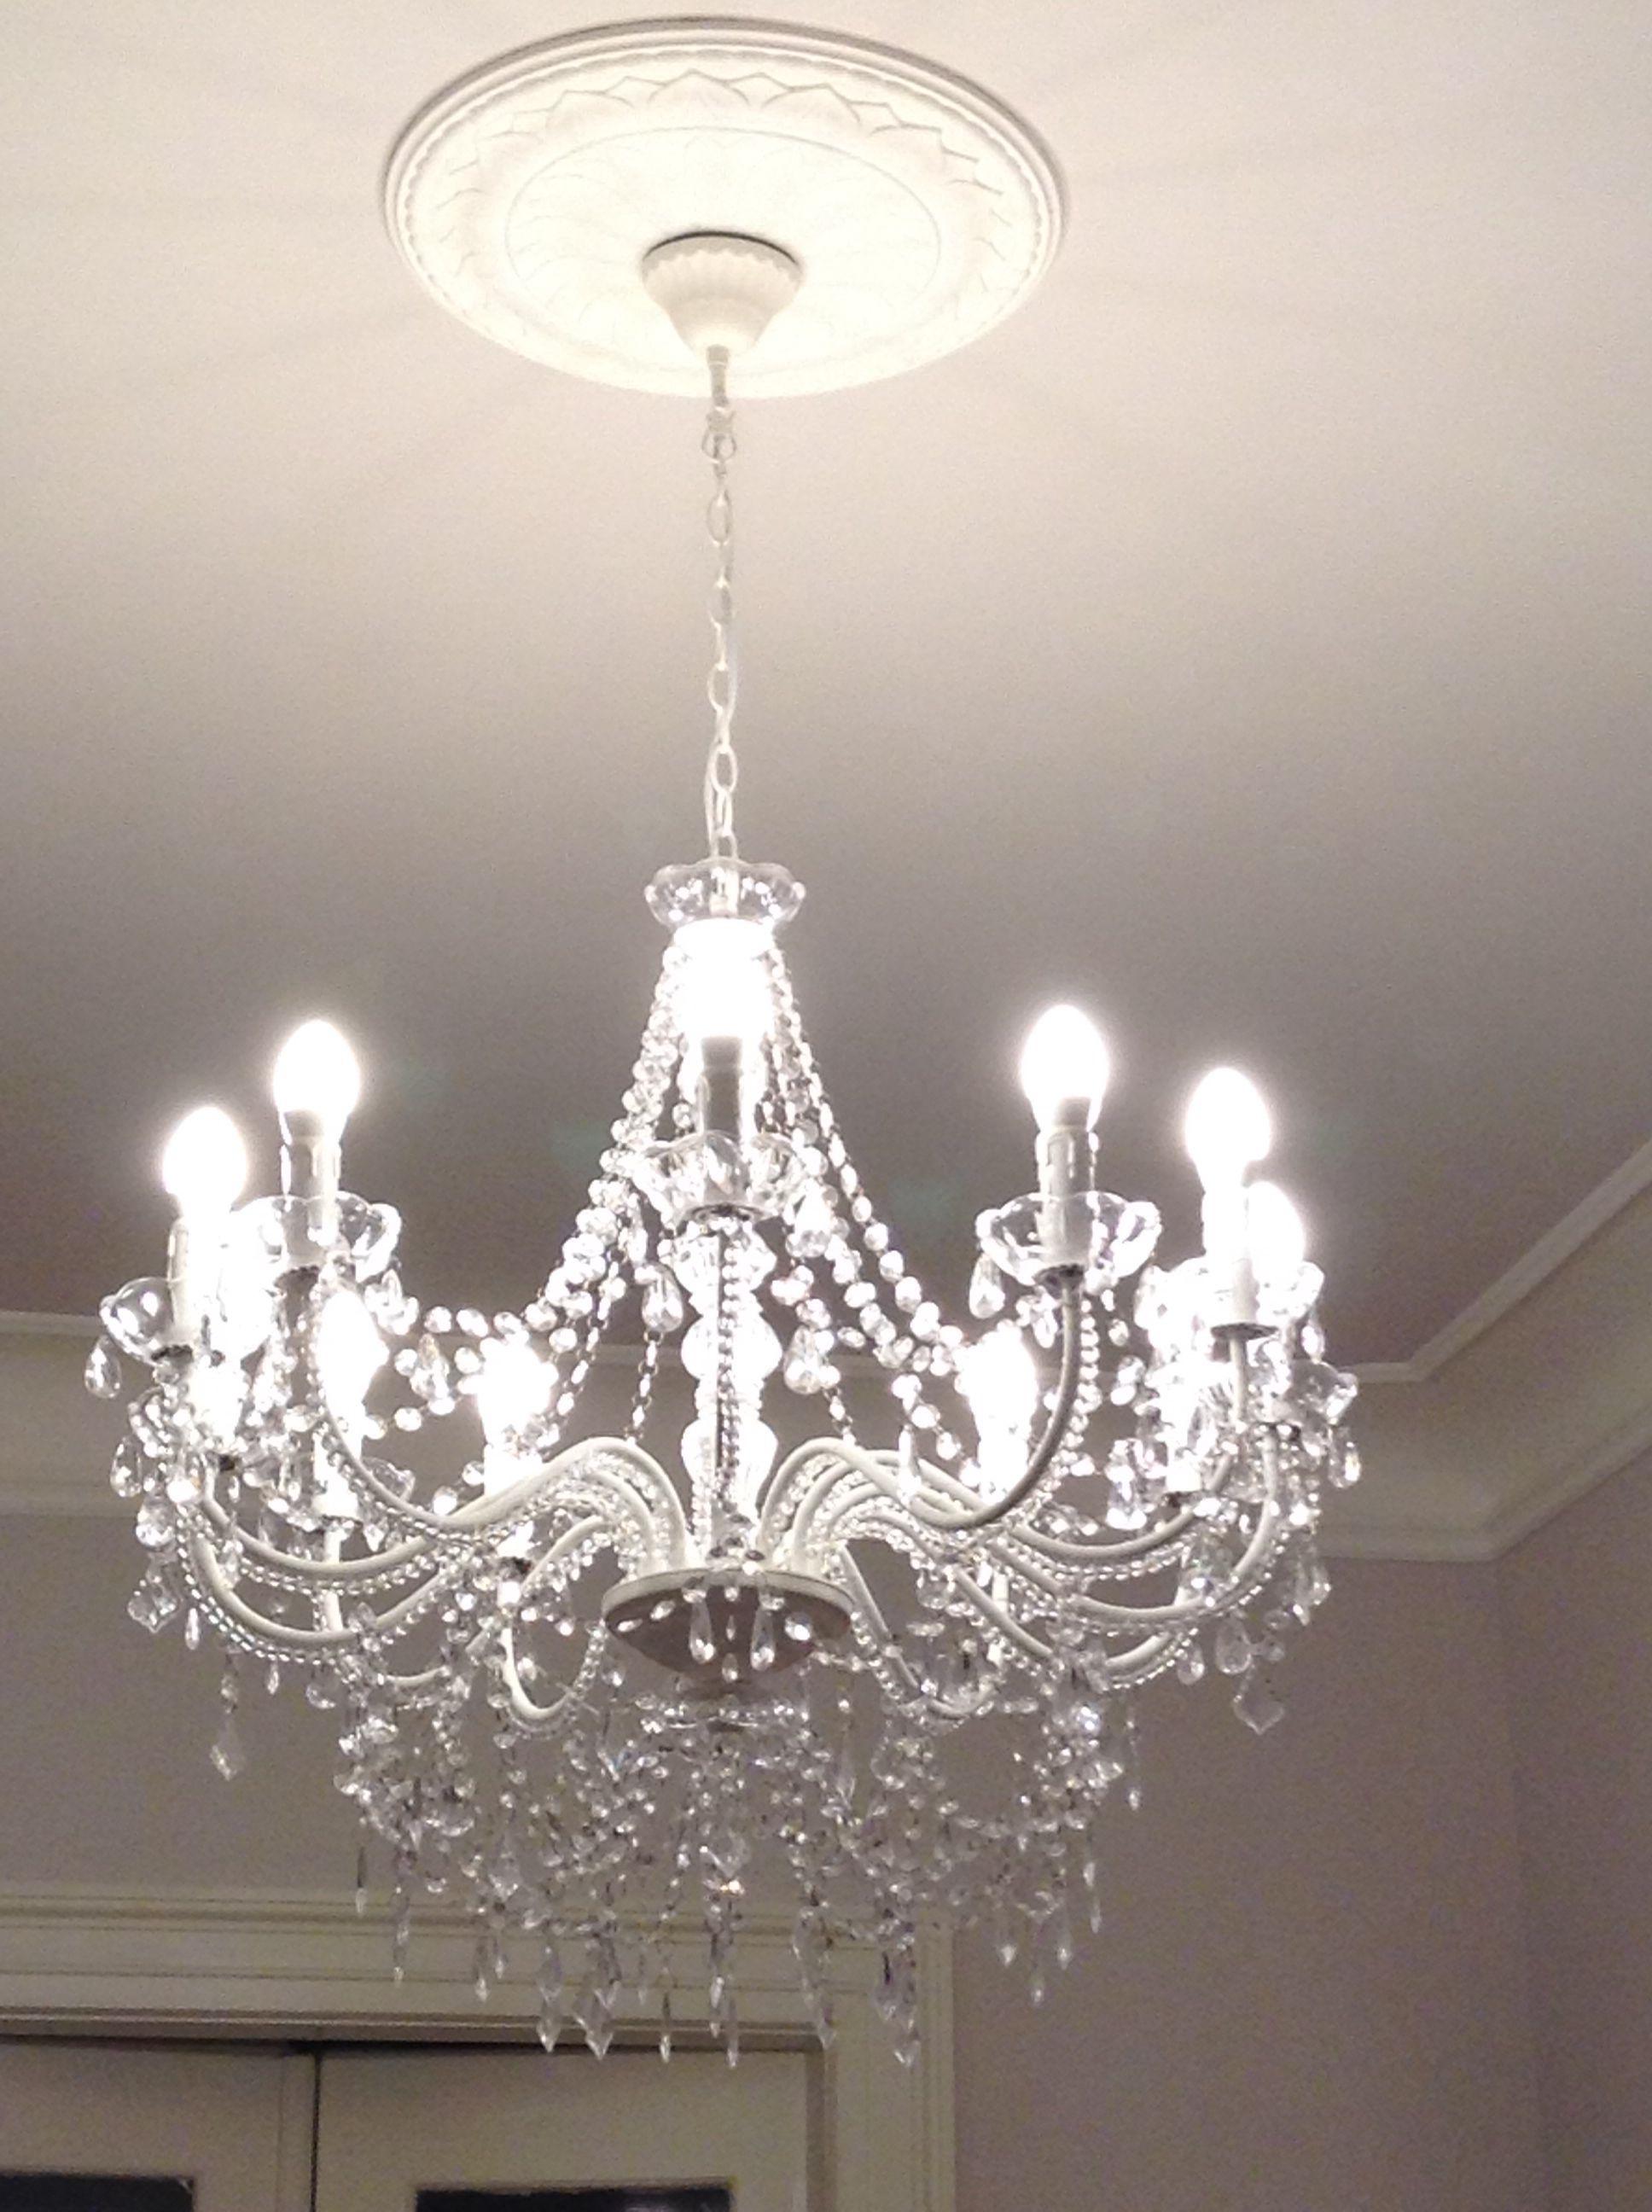 Il mio nuovo lampadario a gocce maison du monde ingresso pinterest lights and house - Chandelier maison du monde ...